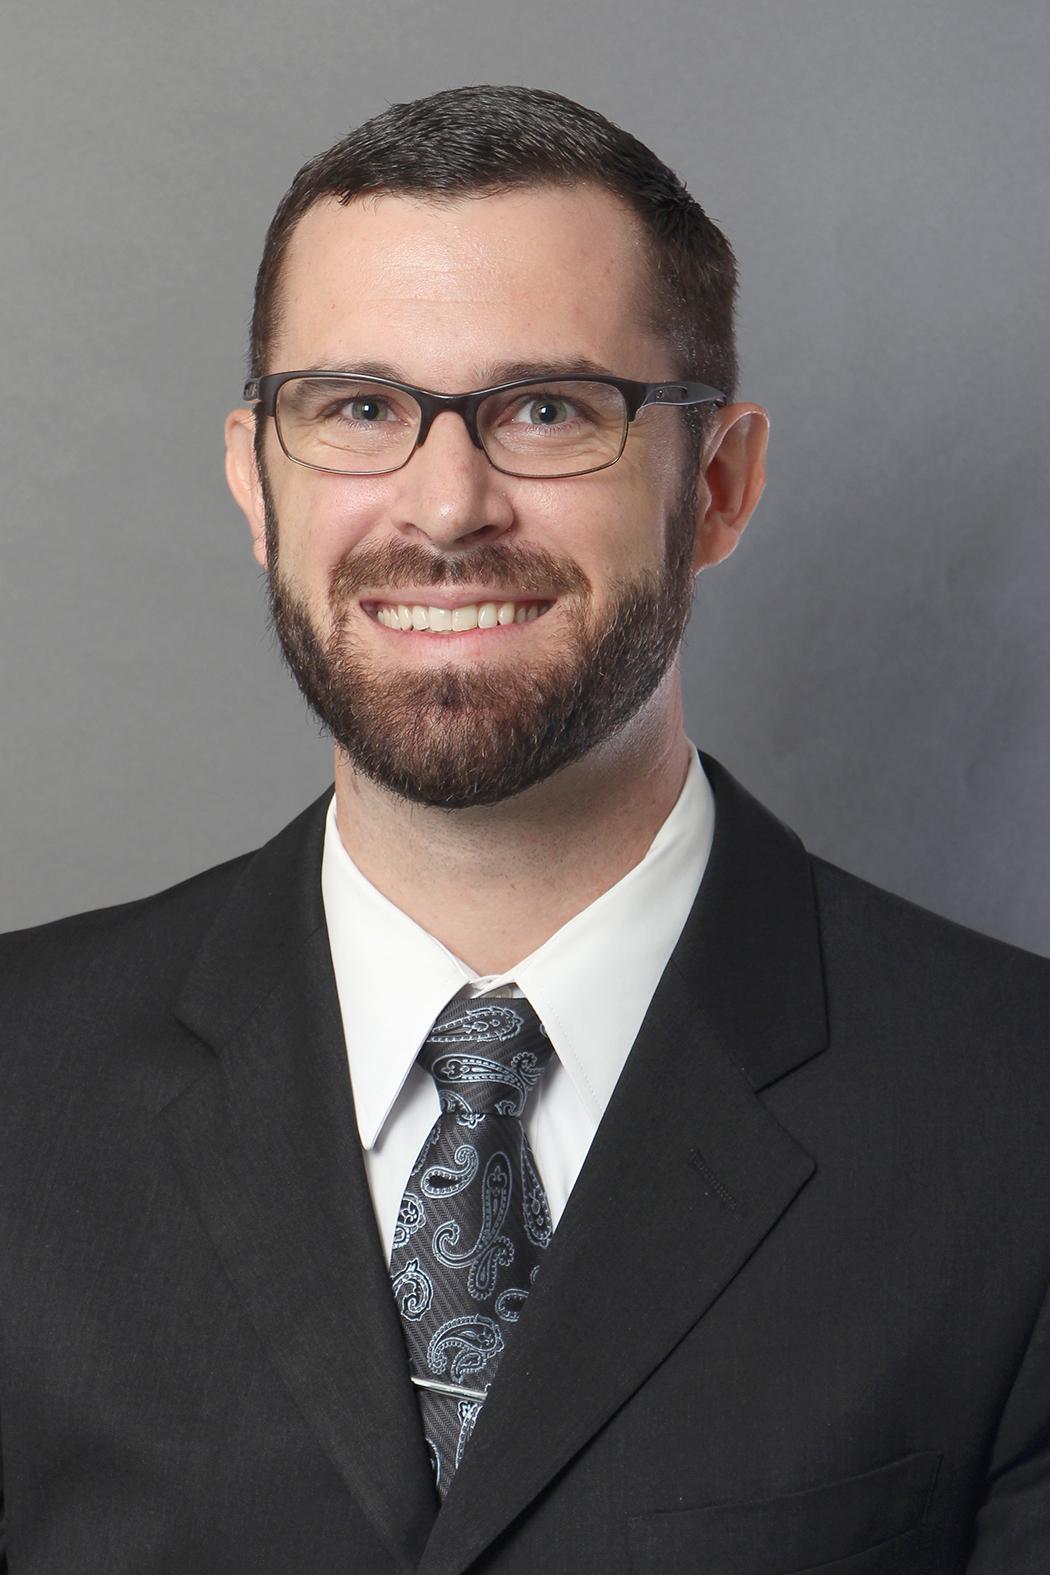 NICHOLAS JOSEPH MCCARTHY Your Financial Professional & Insurance Agent